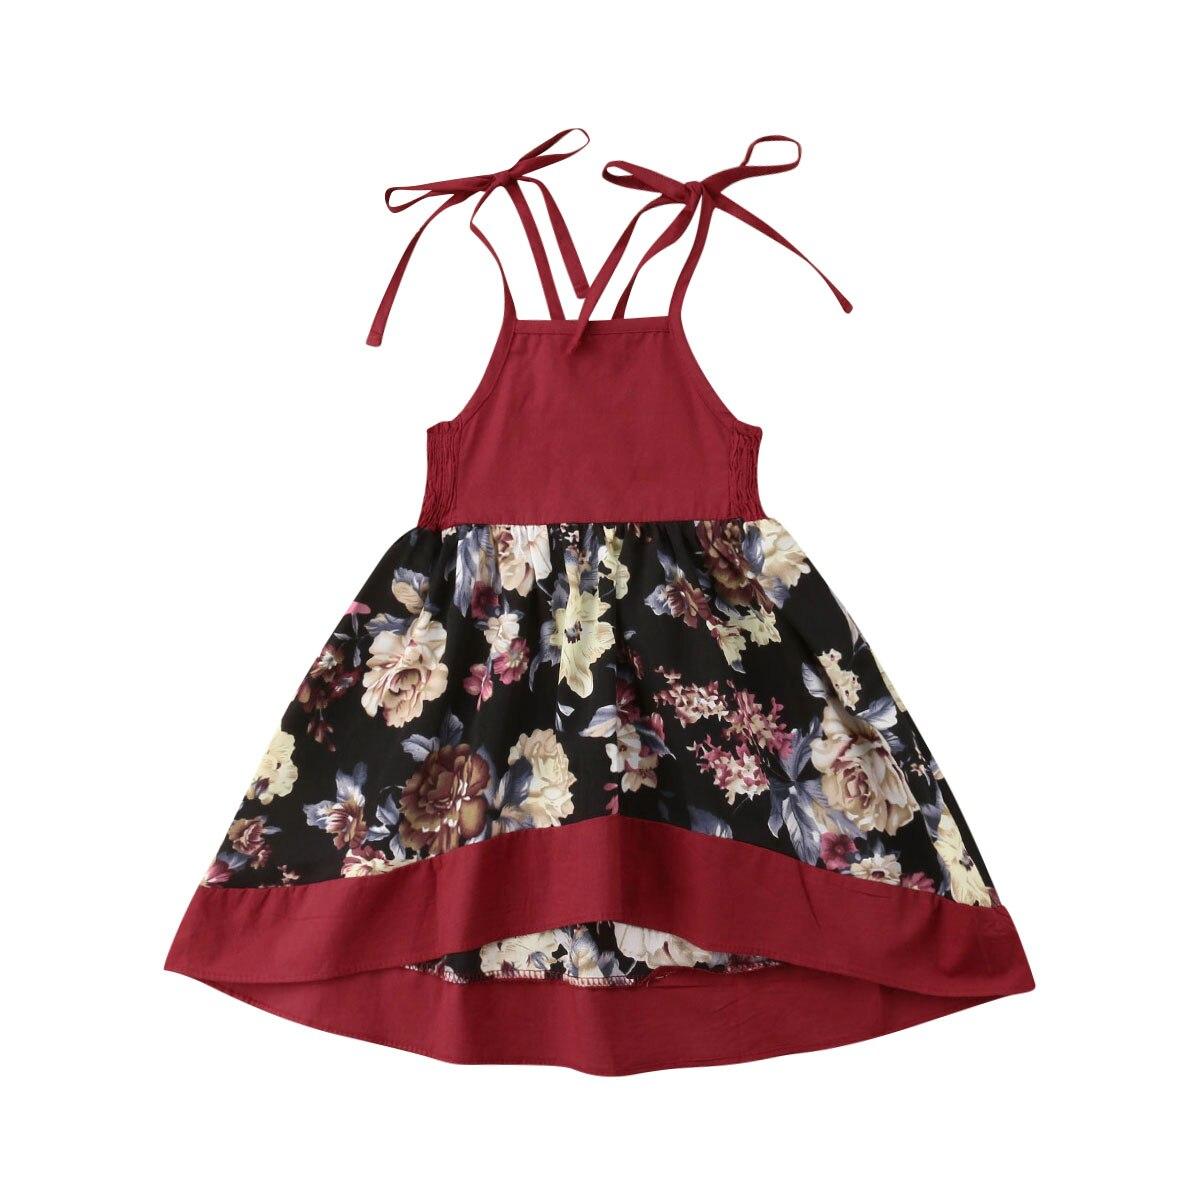 2019 Fashion Red Love Heart Kids Girl Cute Bear Summer Dress Princess